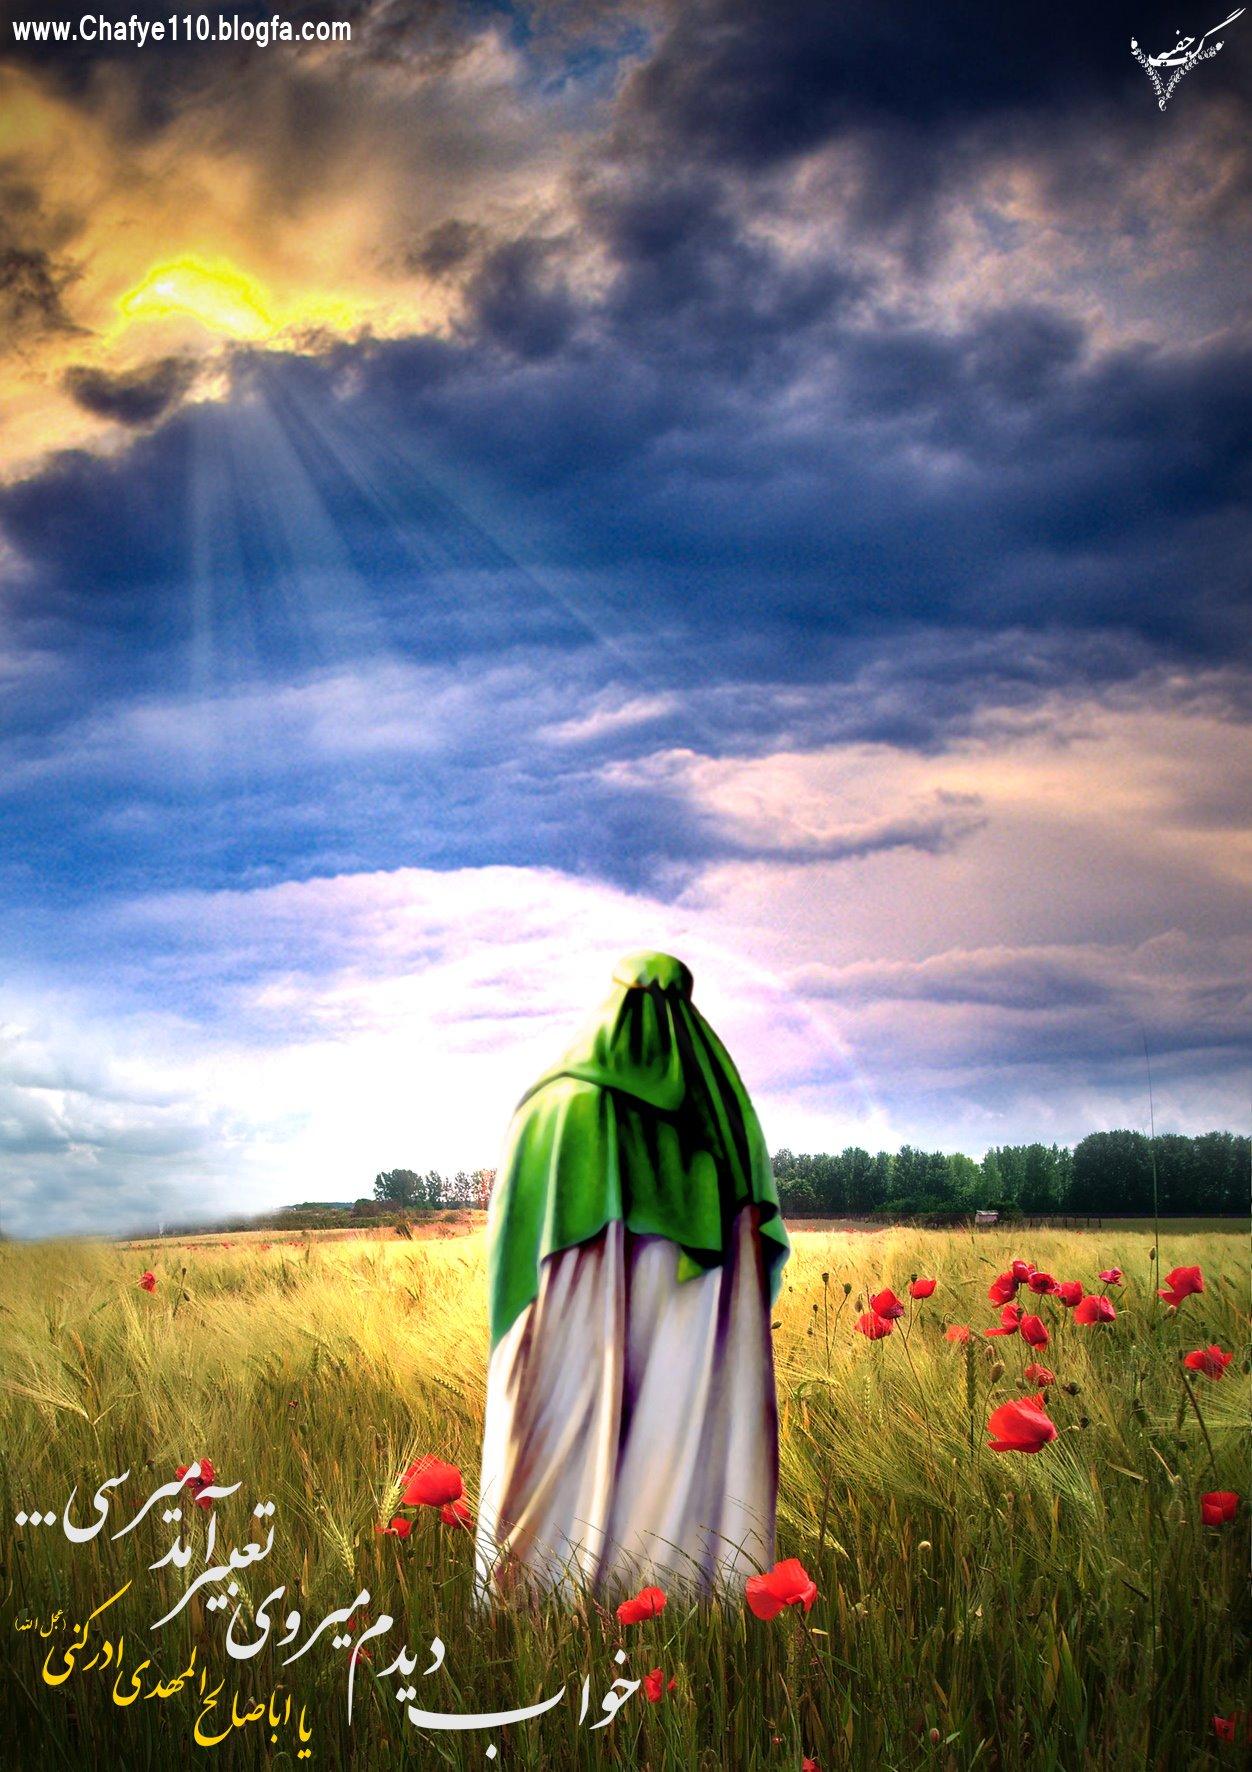 امام زمان(عج)---شلمچه سرزمین عشق وایثار